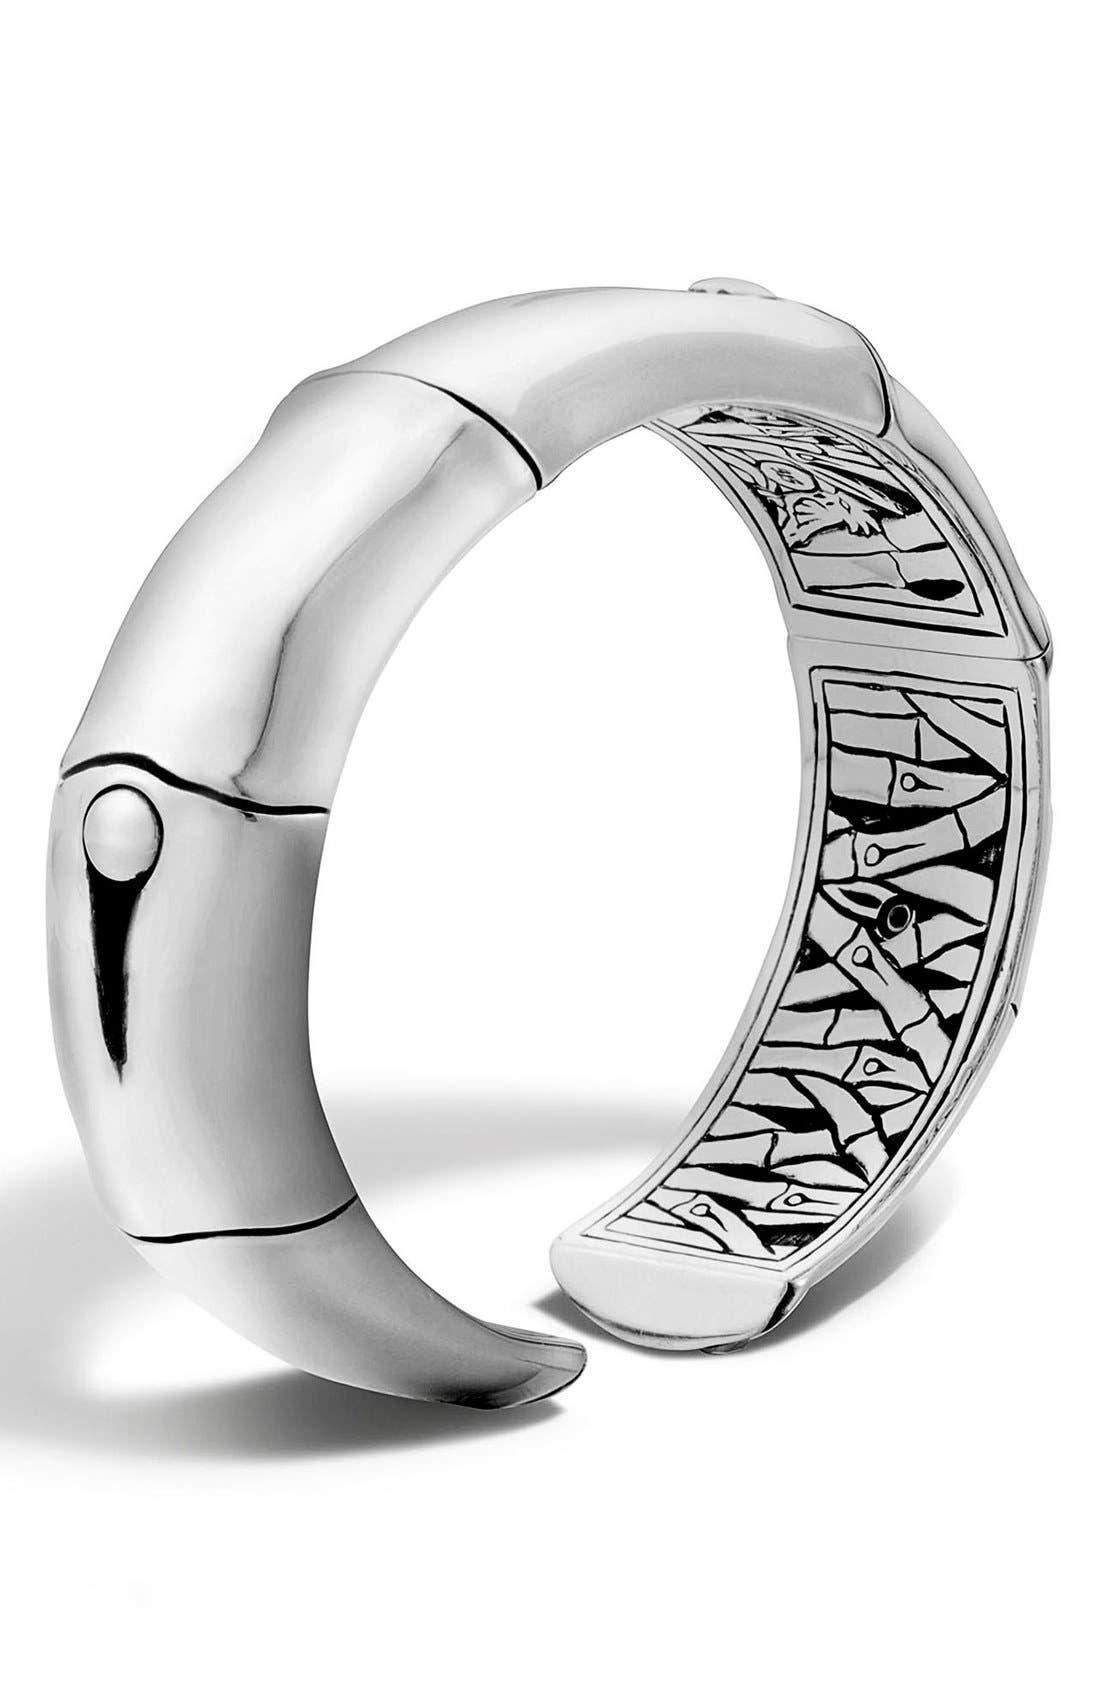 'Bamboo' Silver Wrist Cuff,                             Main thumbnail 1, color,                             SILVER